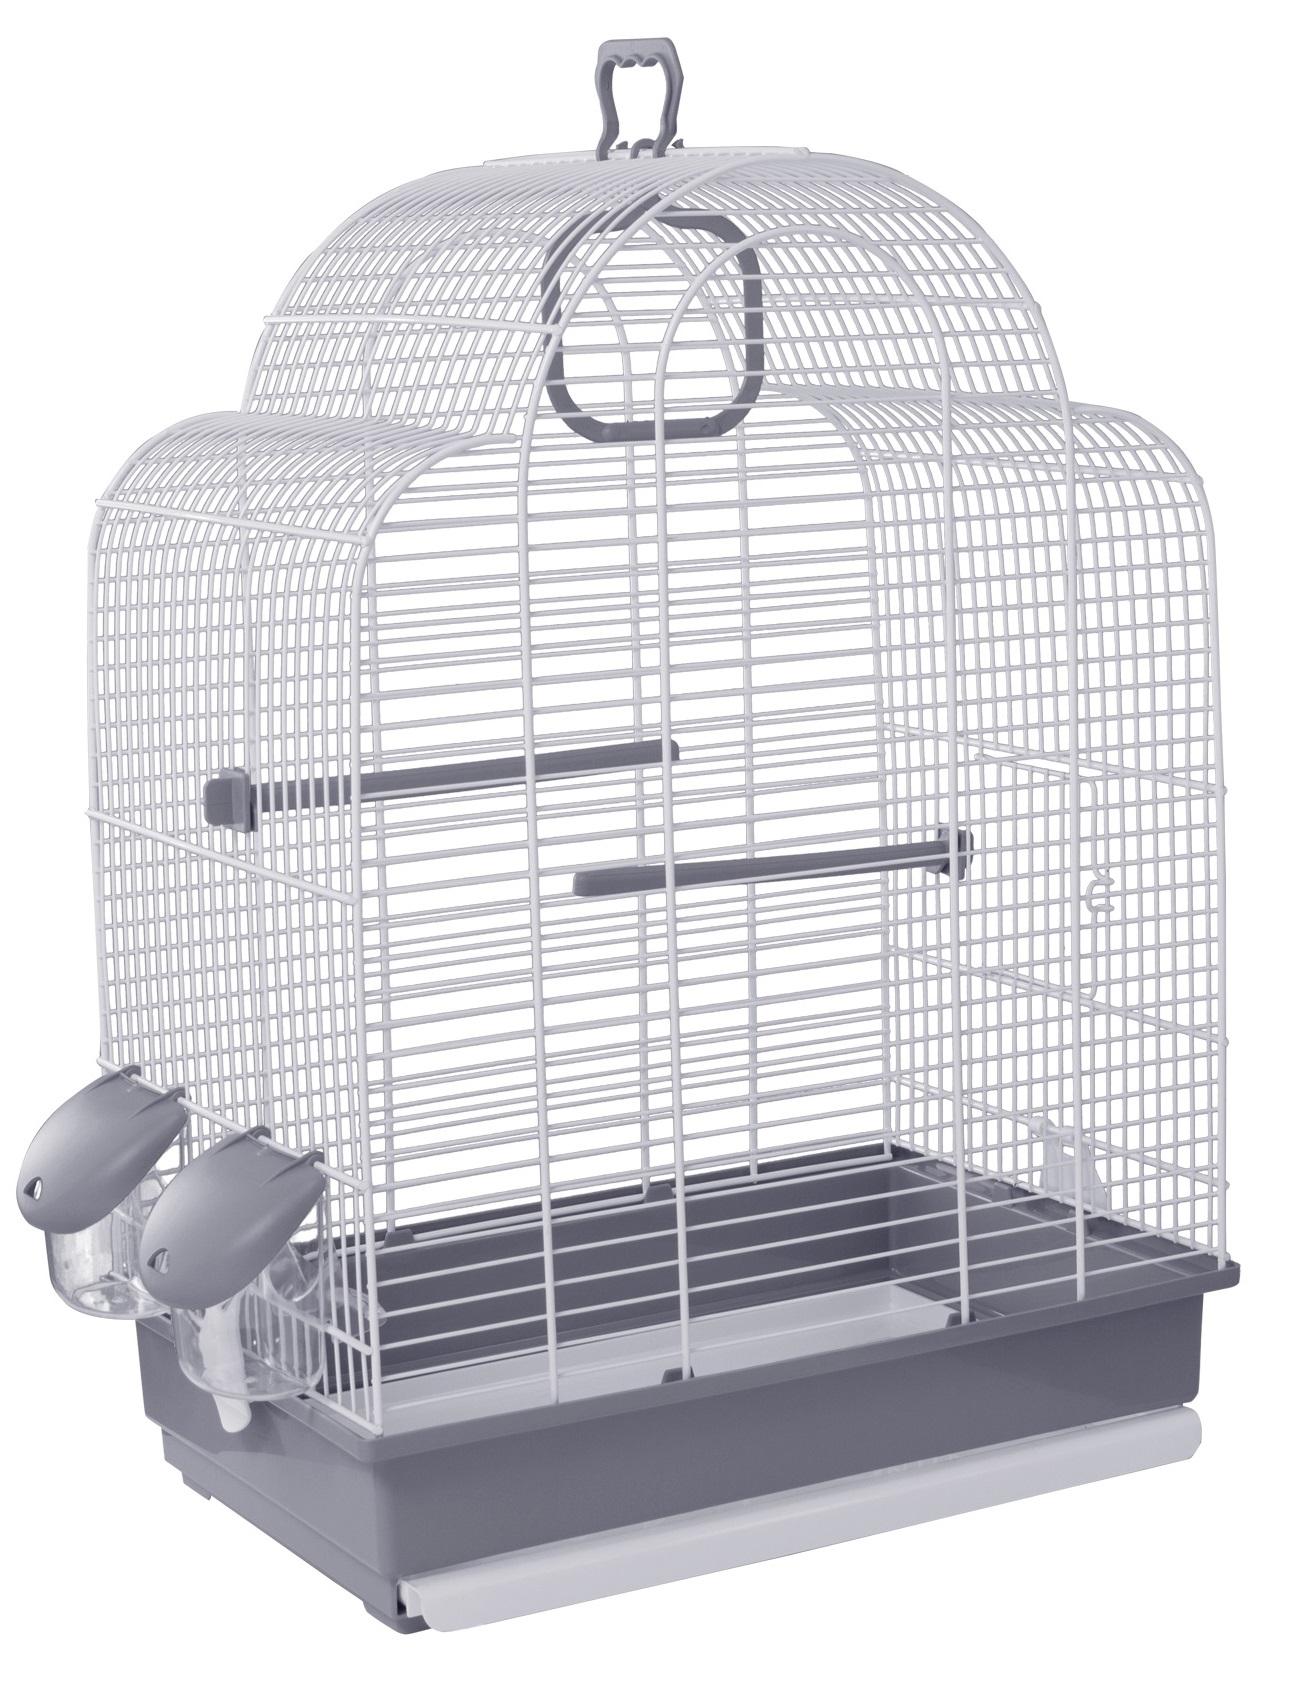 Клетка для птиц Voltrega (648) цвет белый/серый